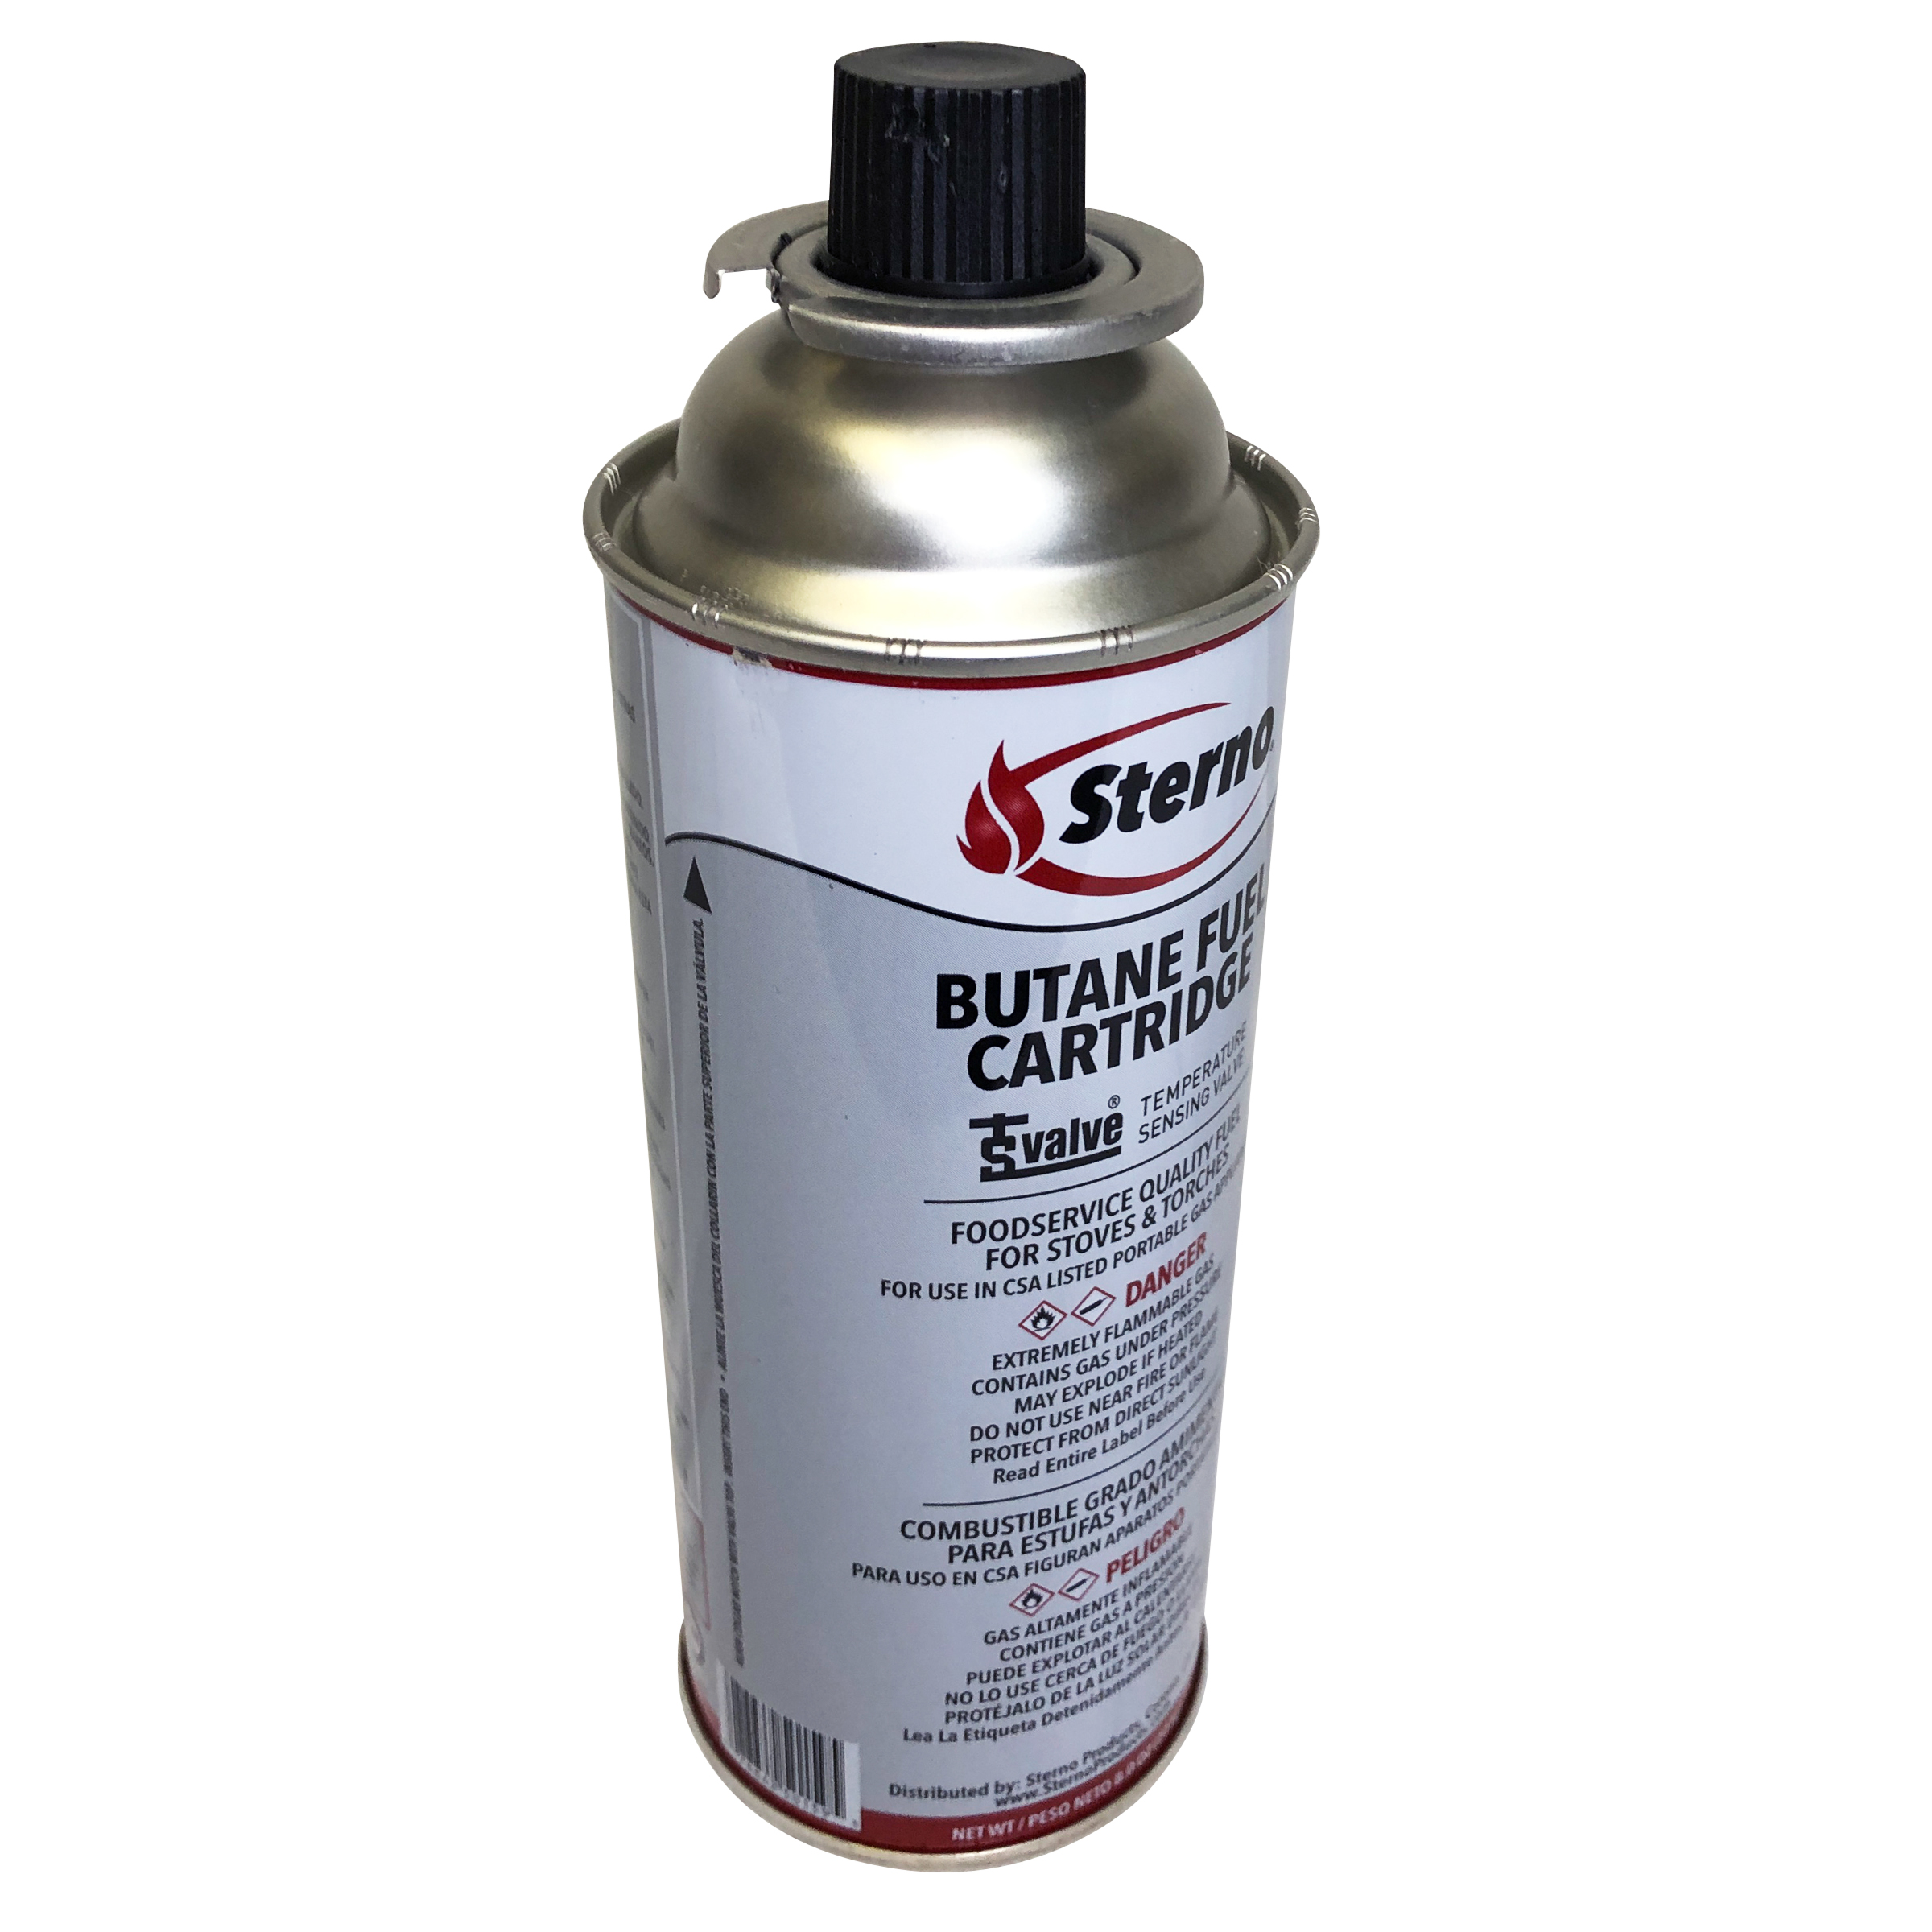 Sterno 50162 butane fuel